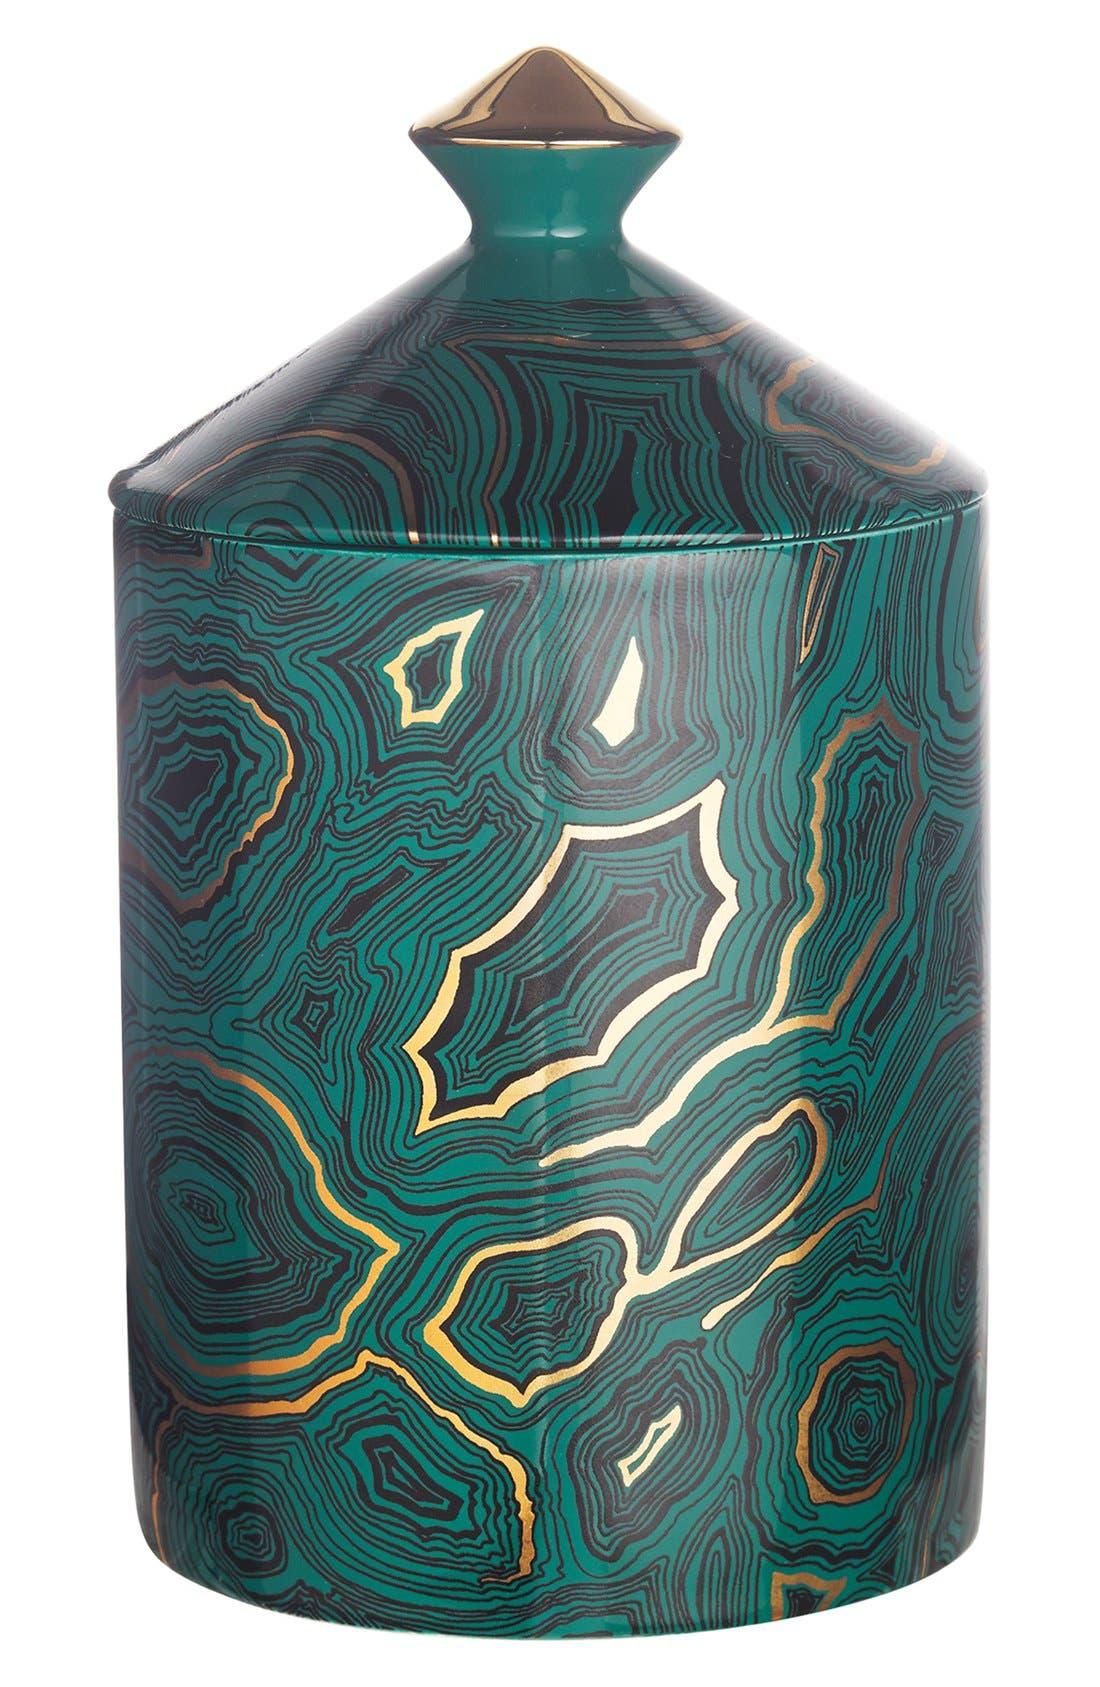 'Malachite' Lidded Candle,                         Main,                         color, 000